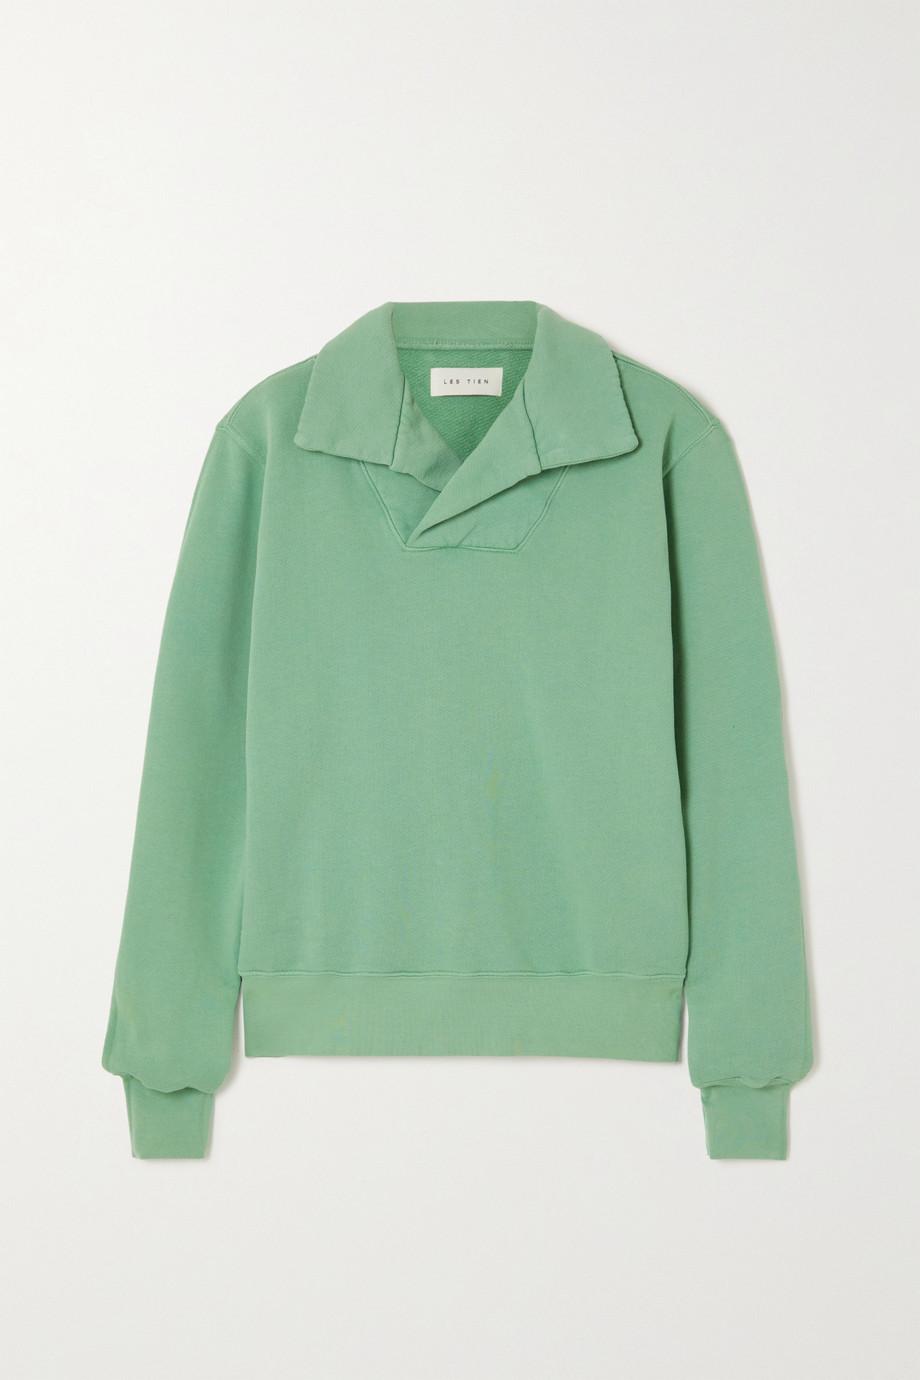 Les Tien Cotton-jersey sweatshirt